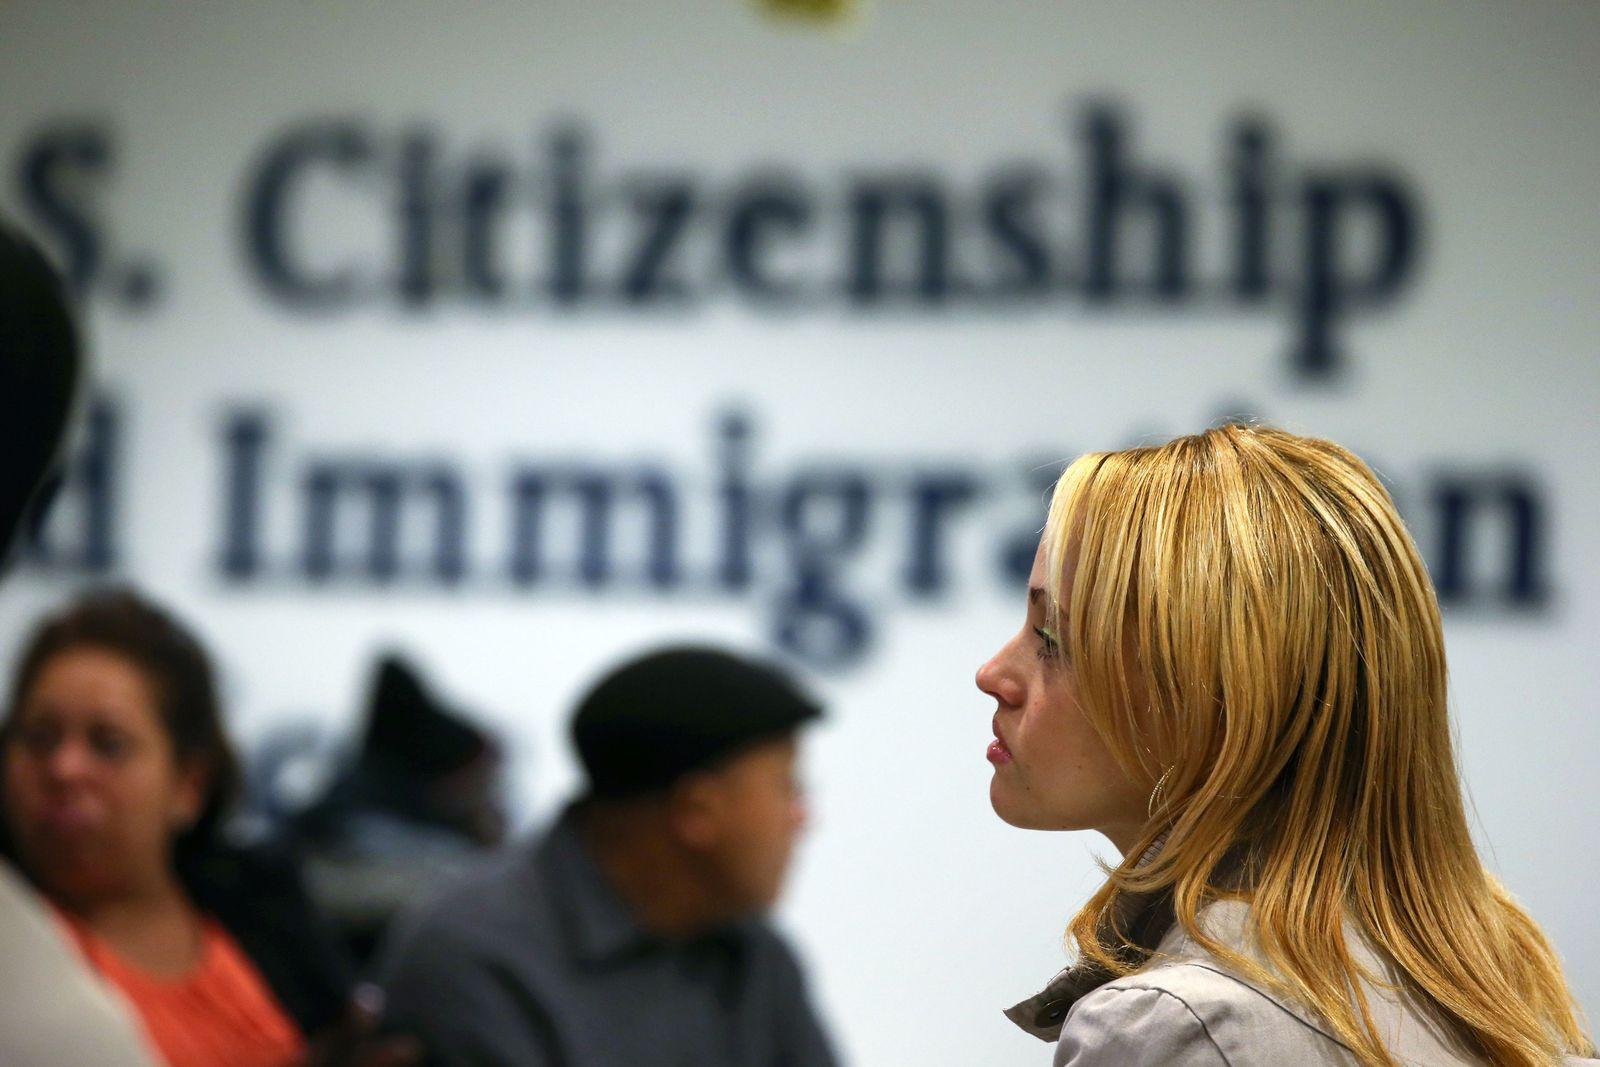 USA / Einwanderung / Einwanderer / Einwanderung / Einwandern